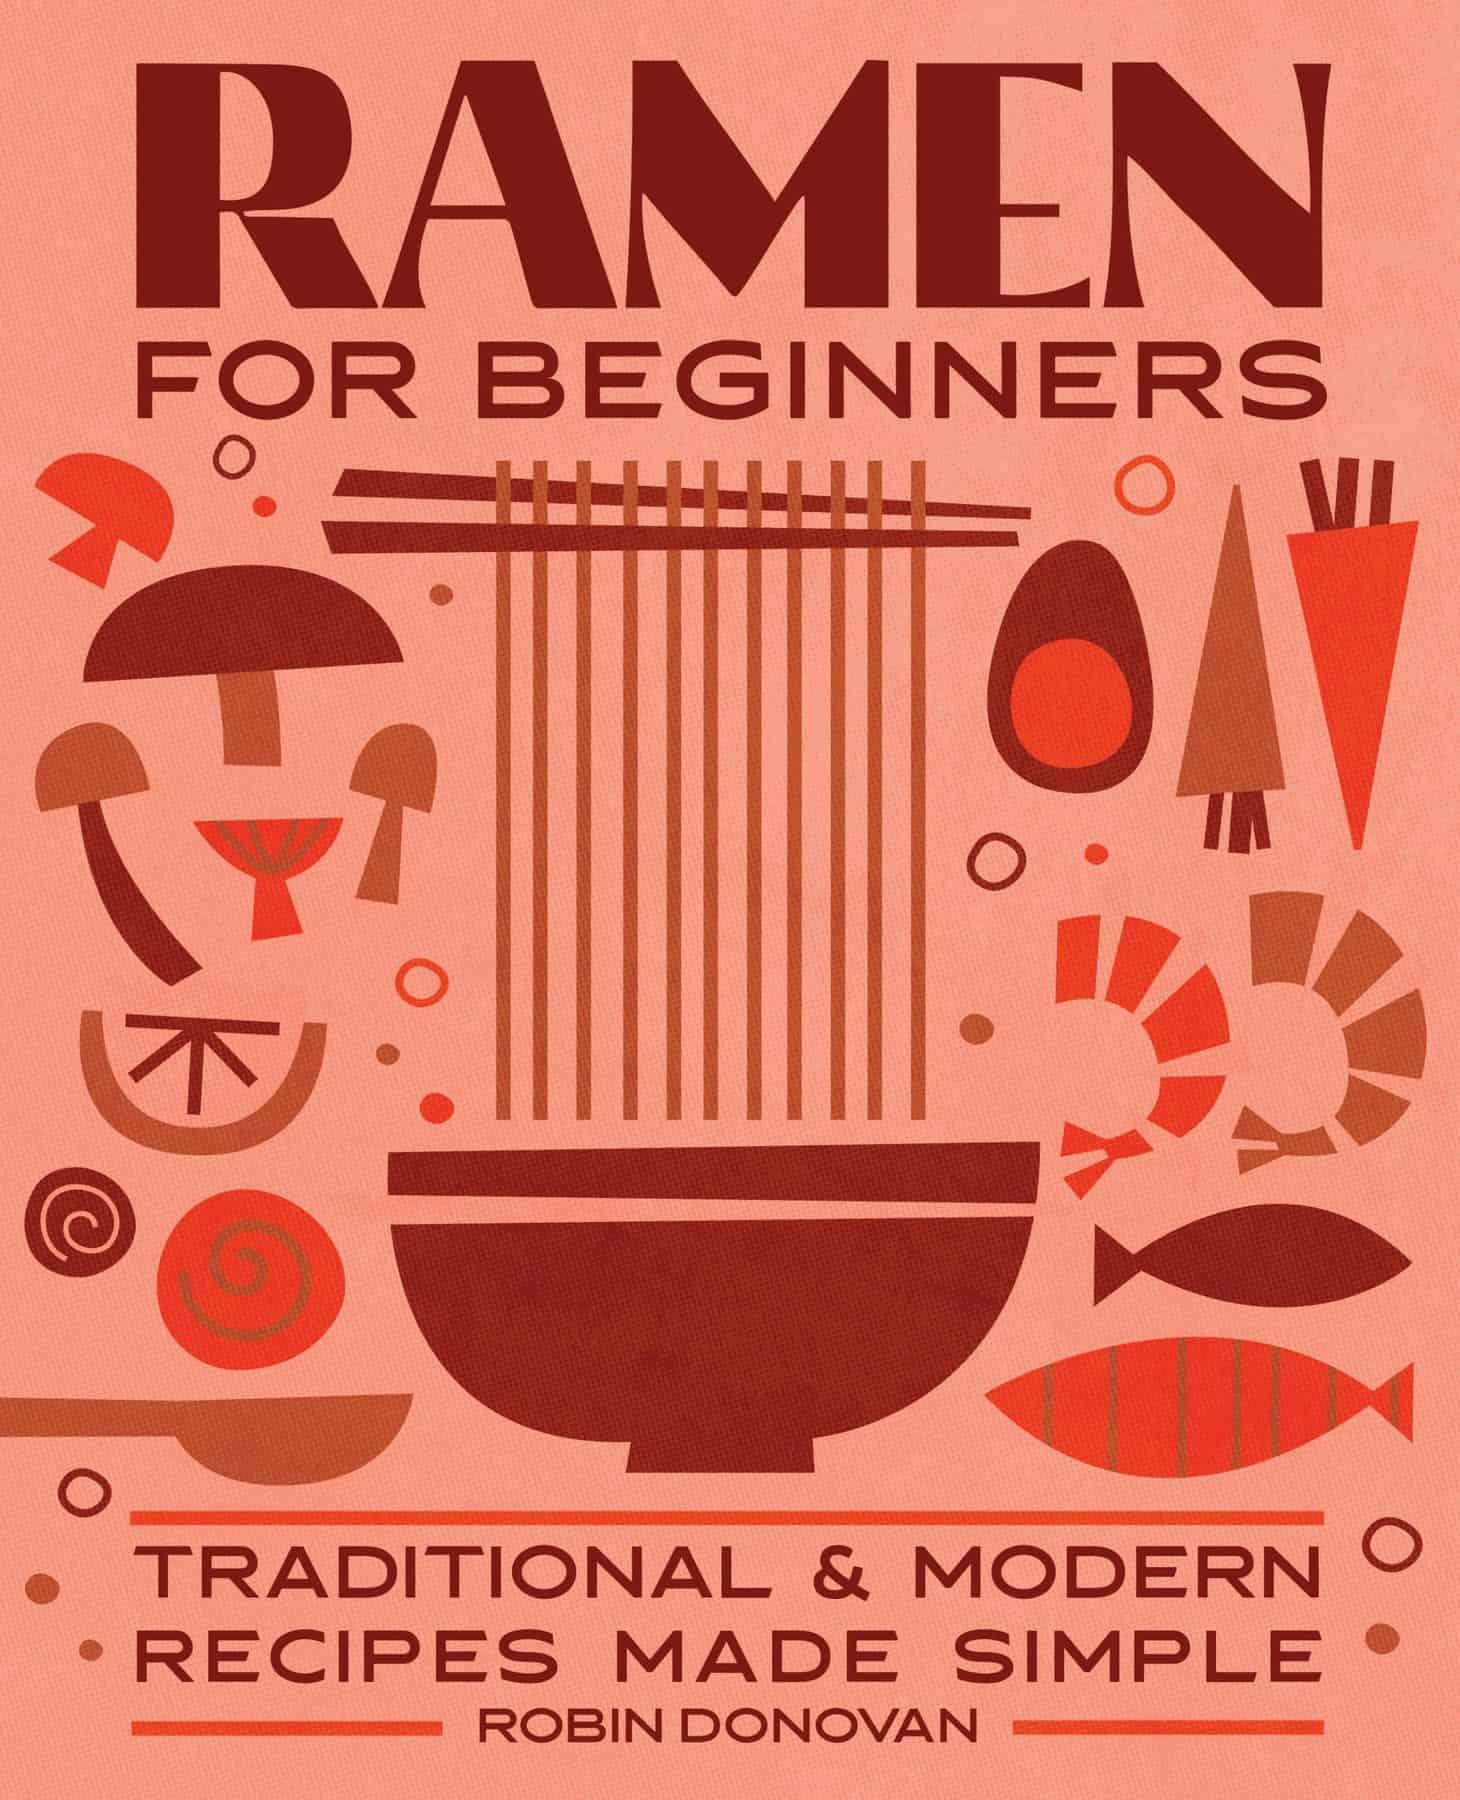 Ramen for Beginners cookbook cover